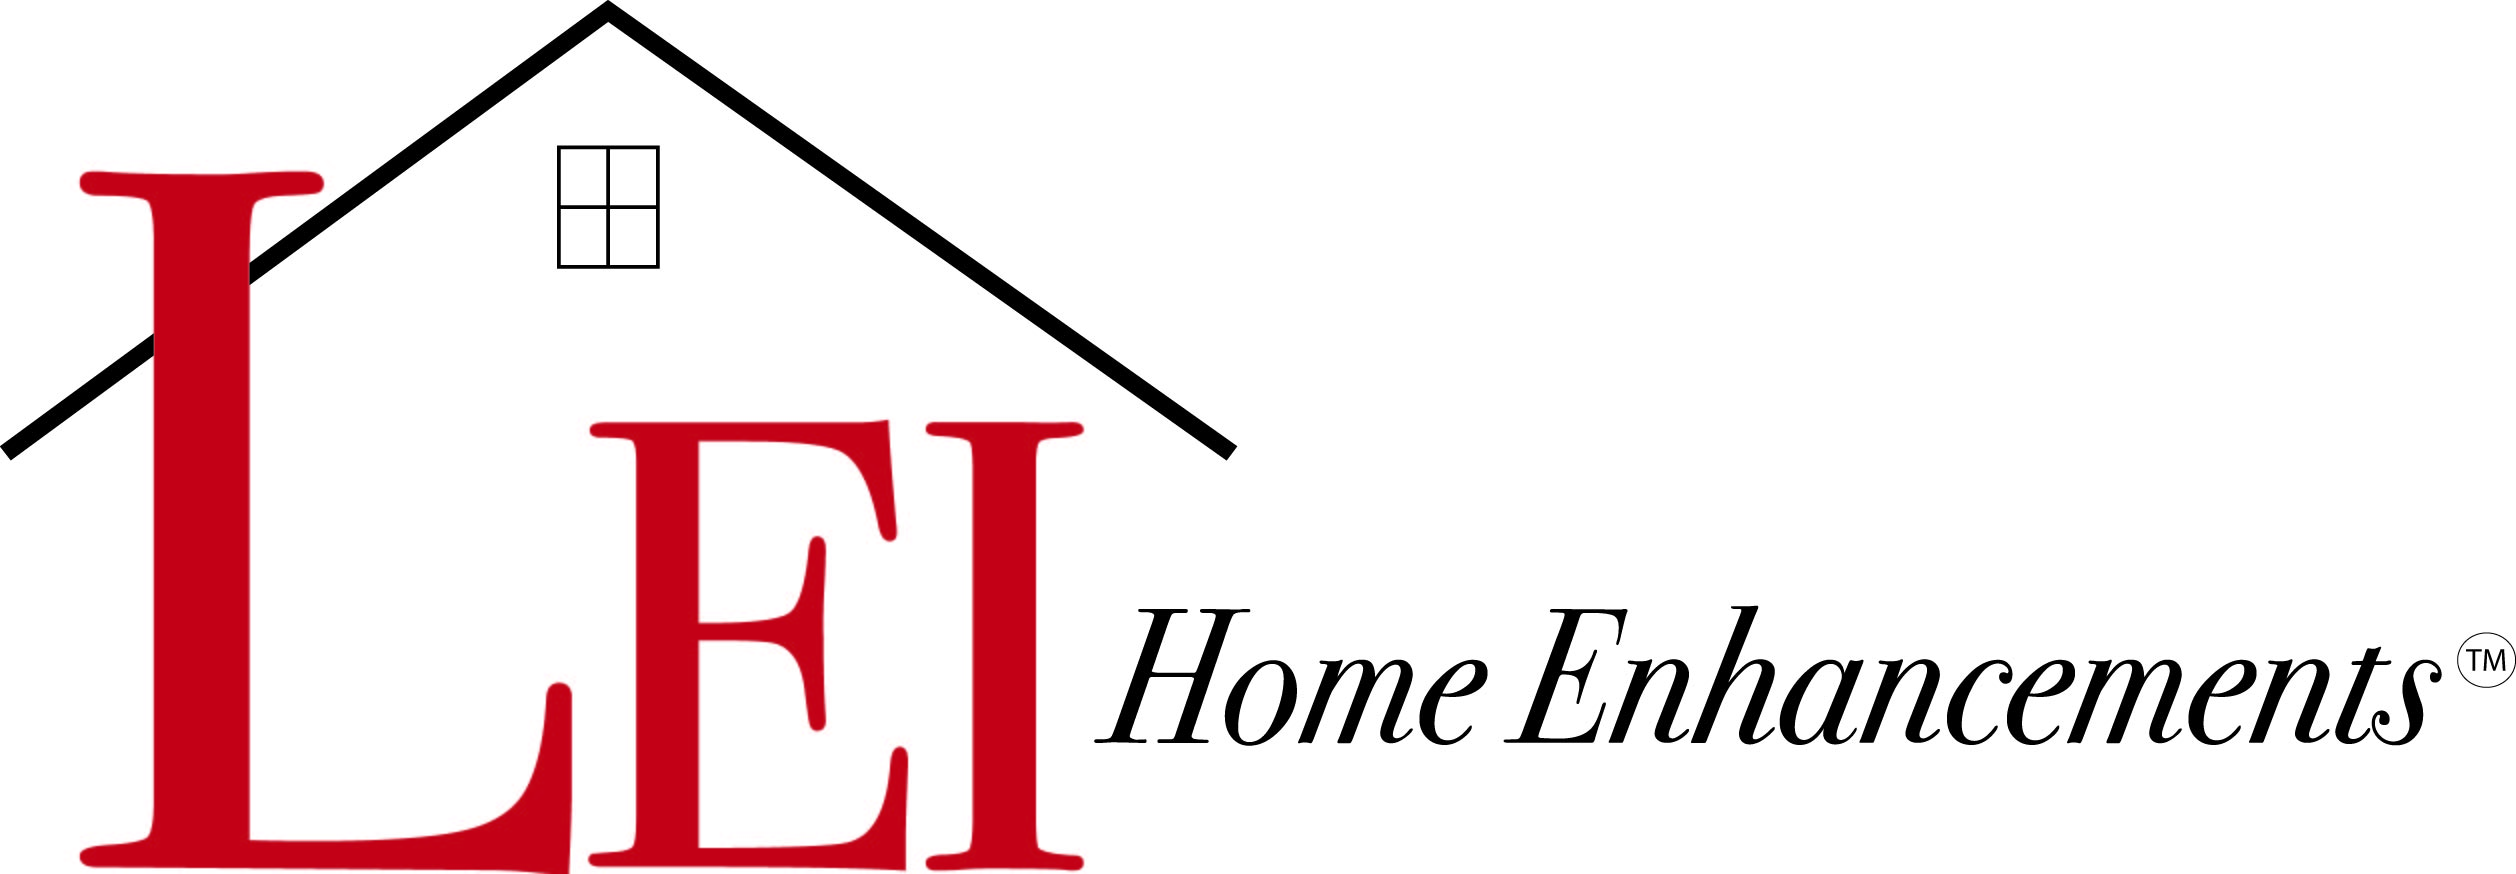 Lei Home Enhancements Reviews Cincinnati Oh Angie S List